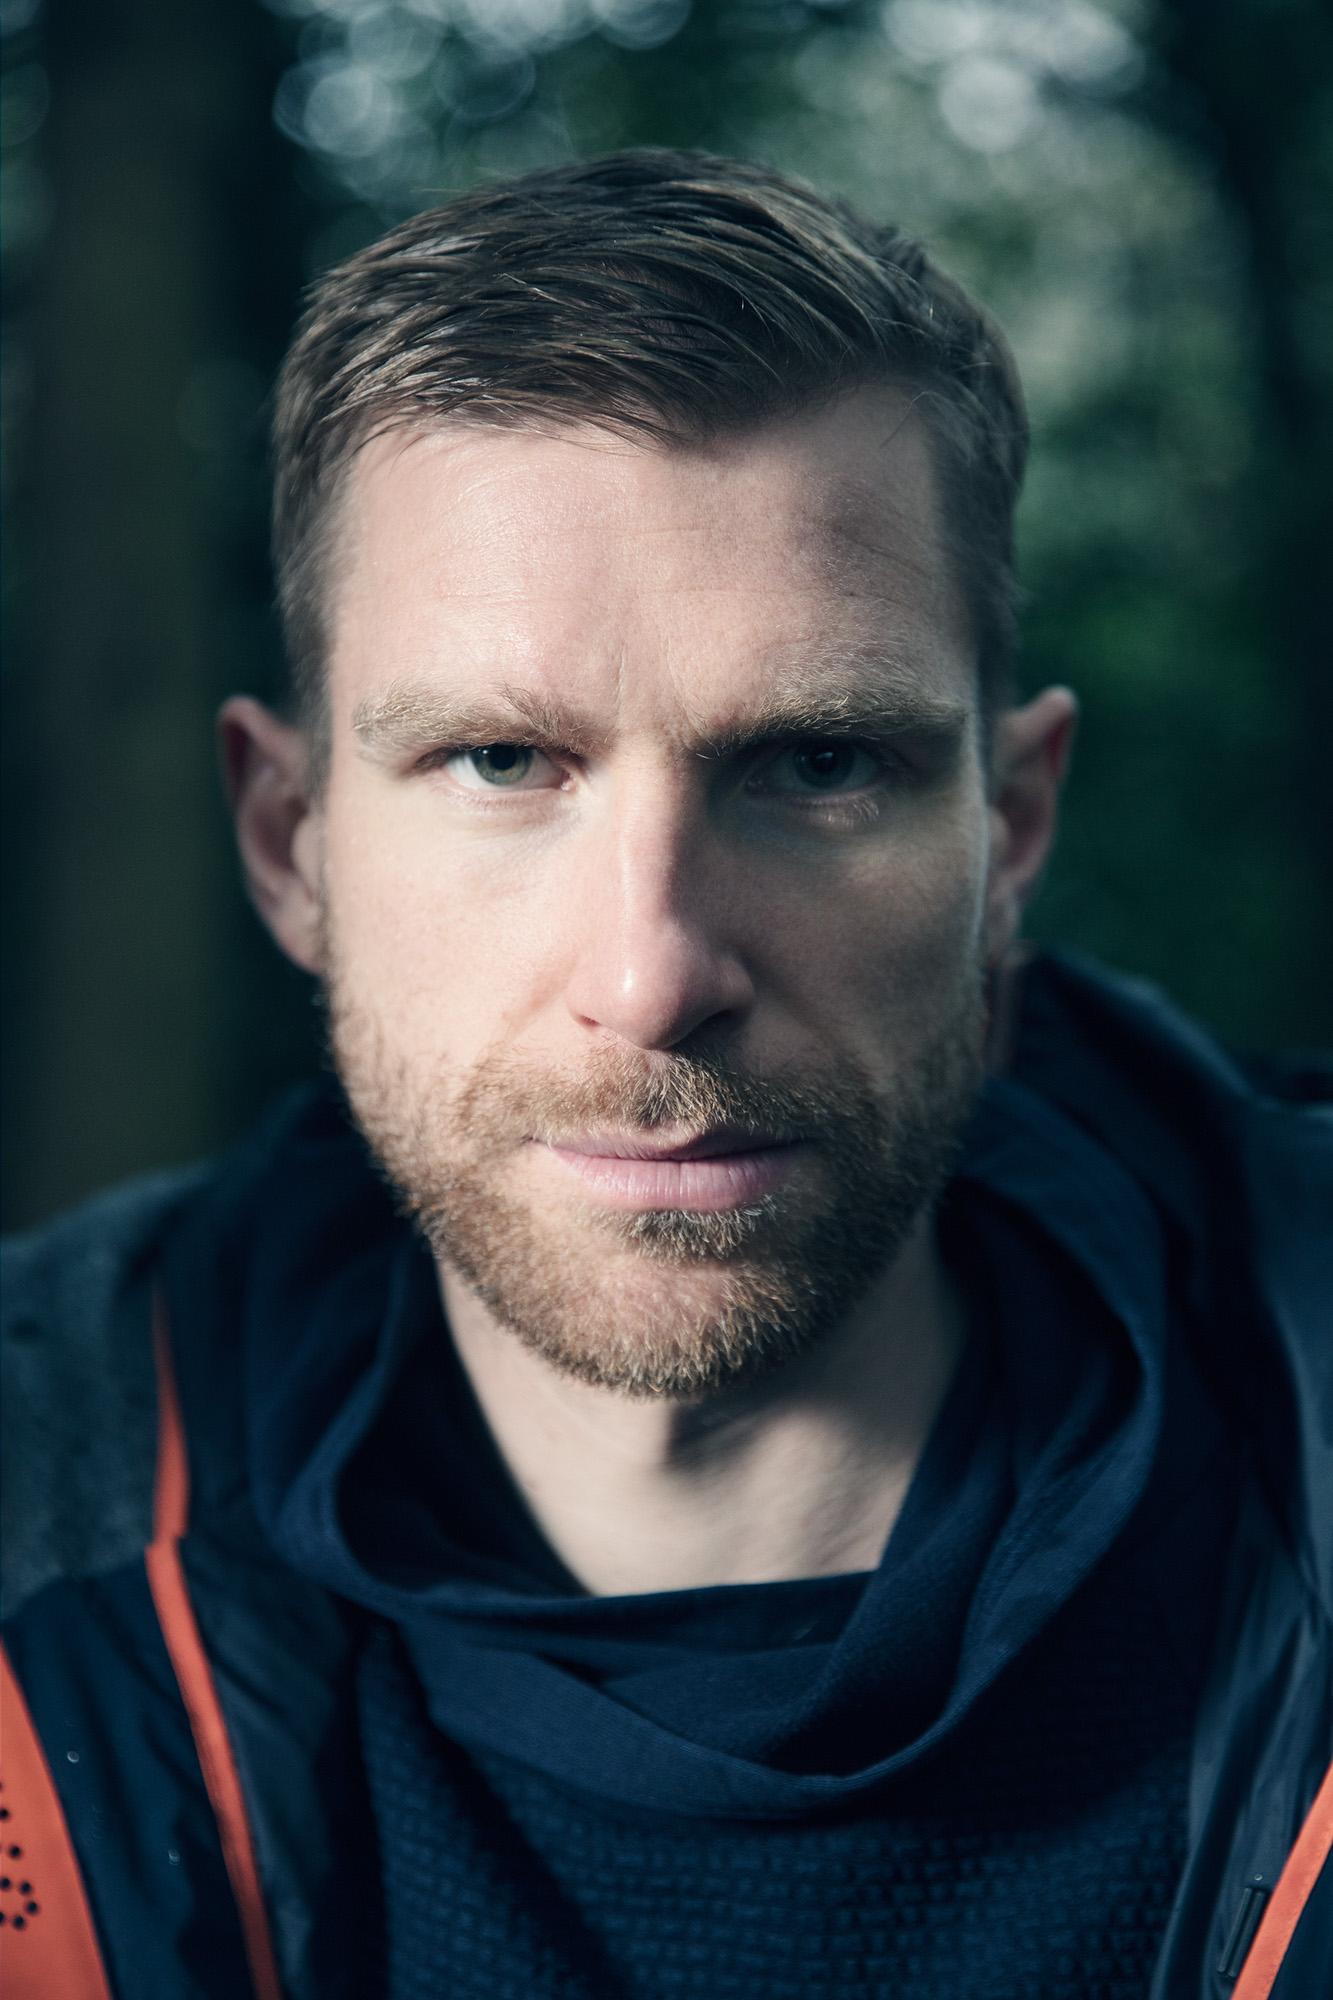 henrik-knudsen-editorial-portraits-03.jpg